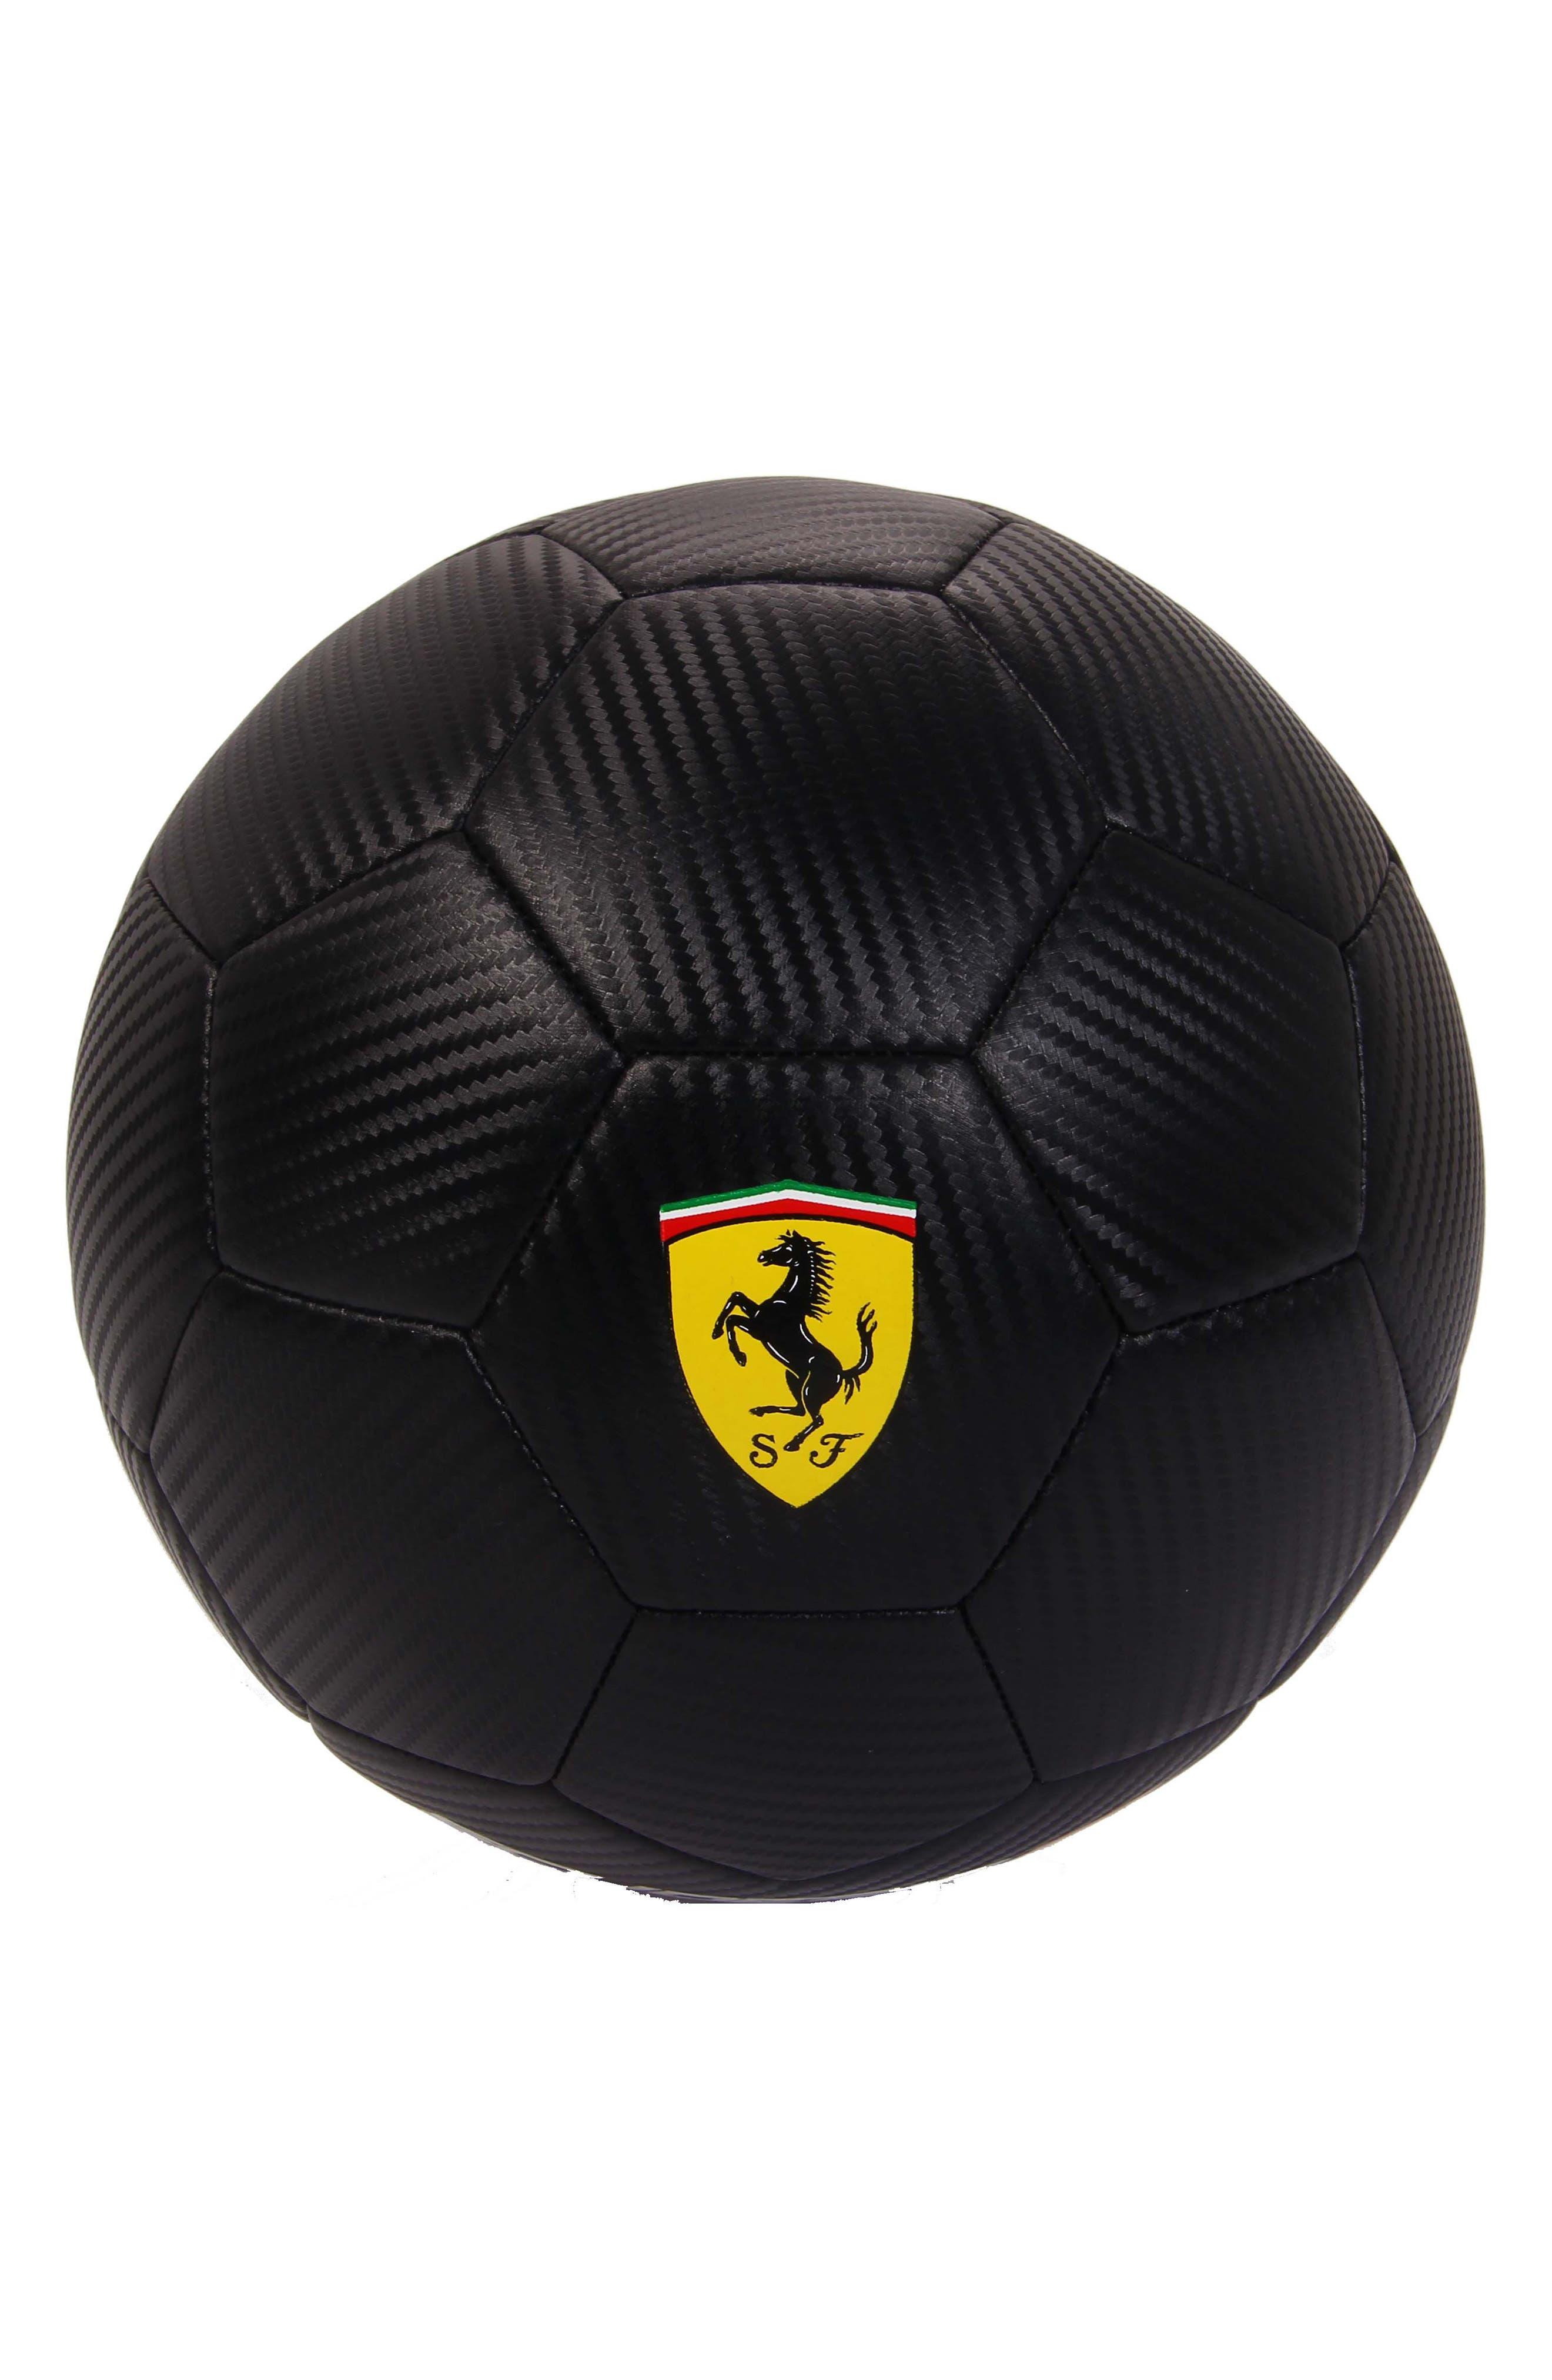 Size 5 Soccer Ball,                             Main thumbnail 1, color,                             BLACK